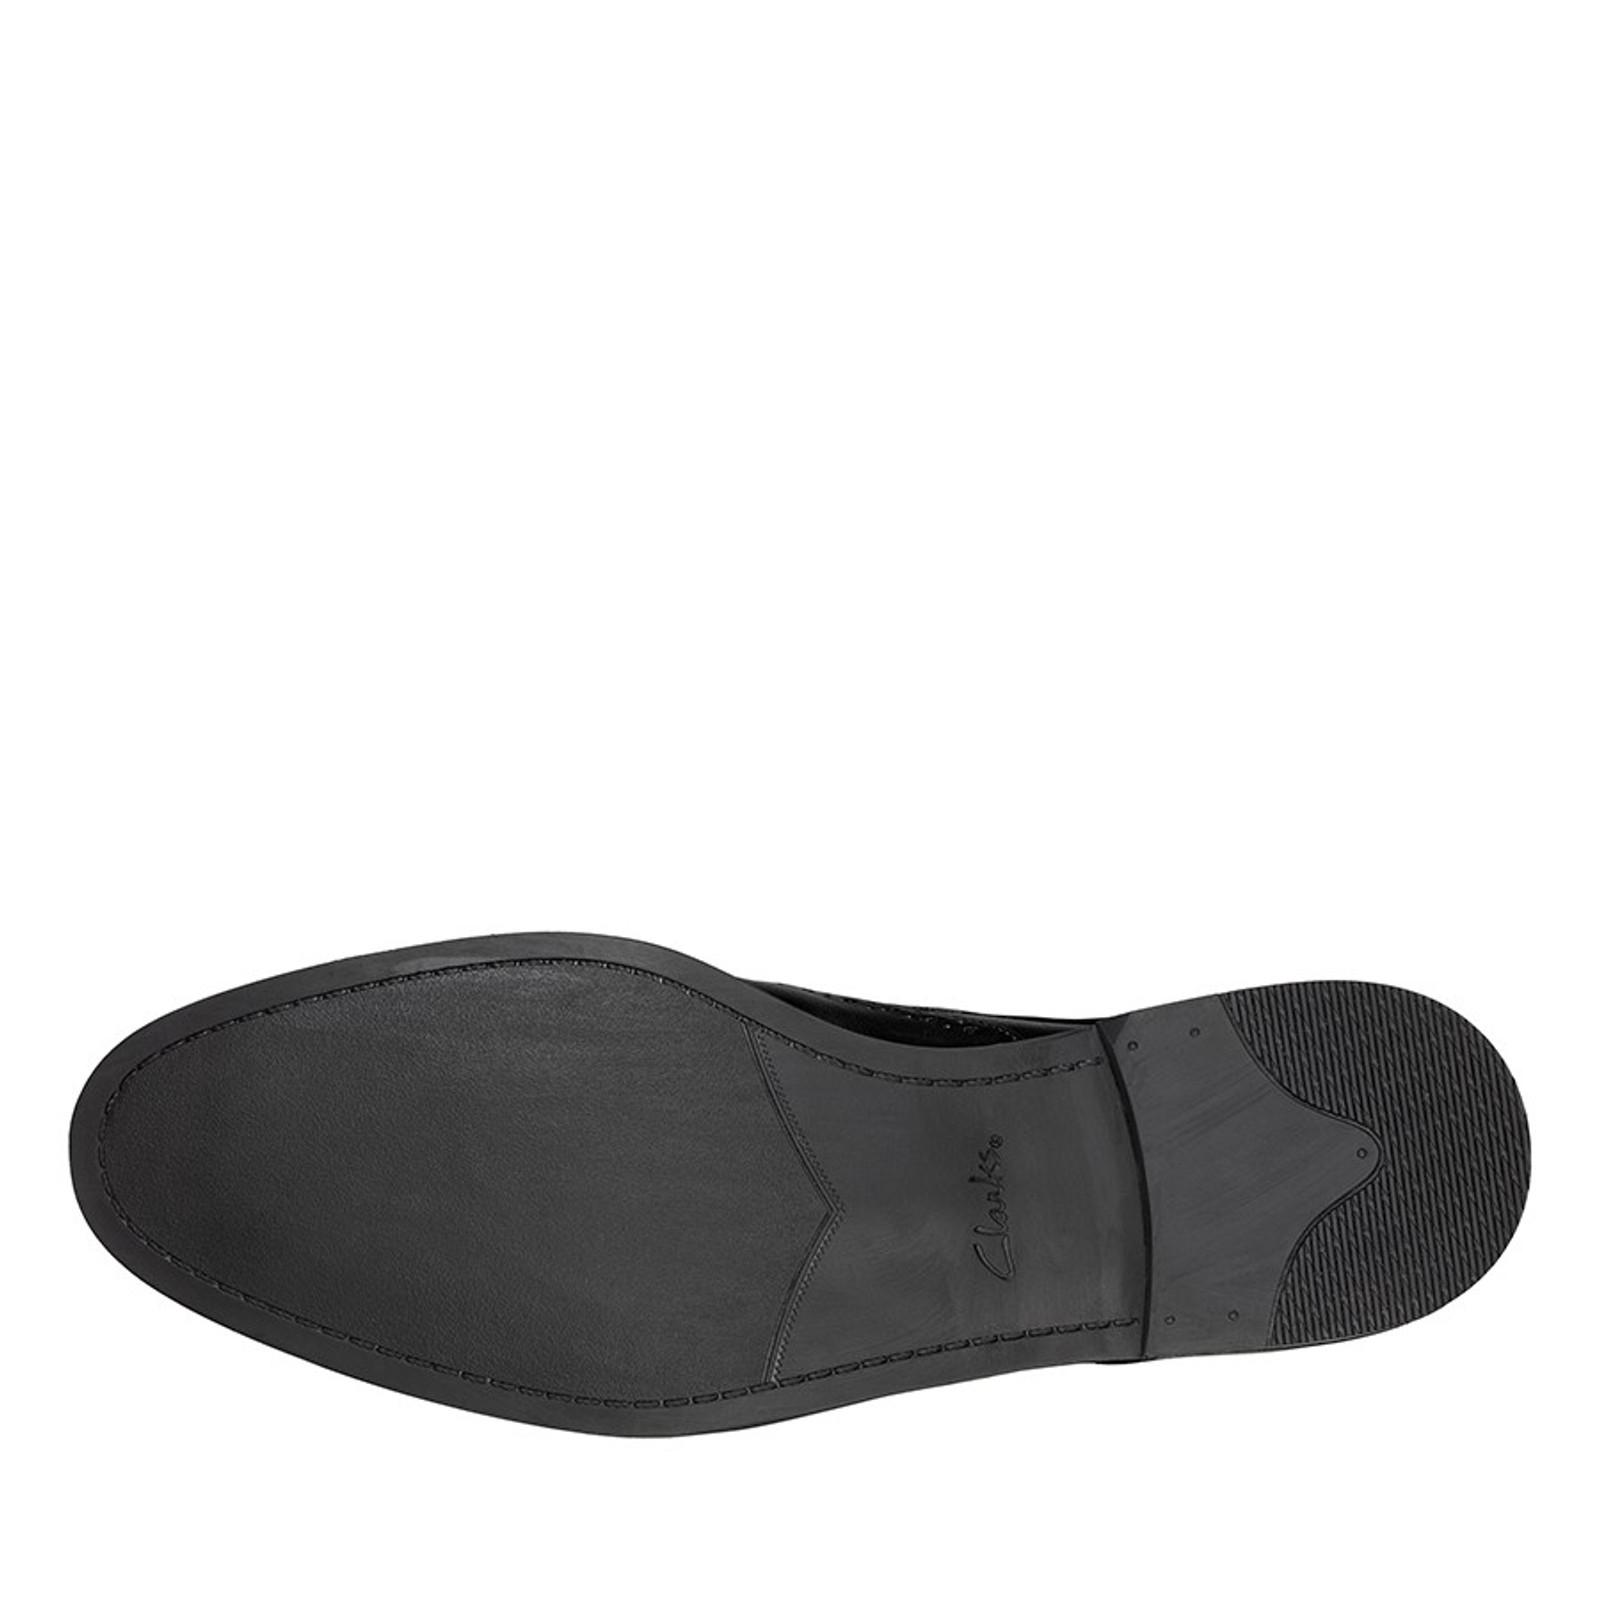 Clarks Mens STANFORD LIMIT Black Leather